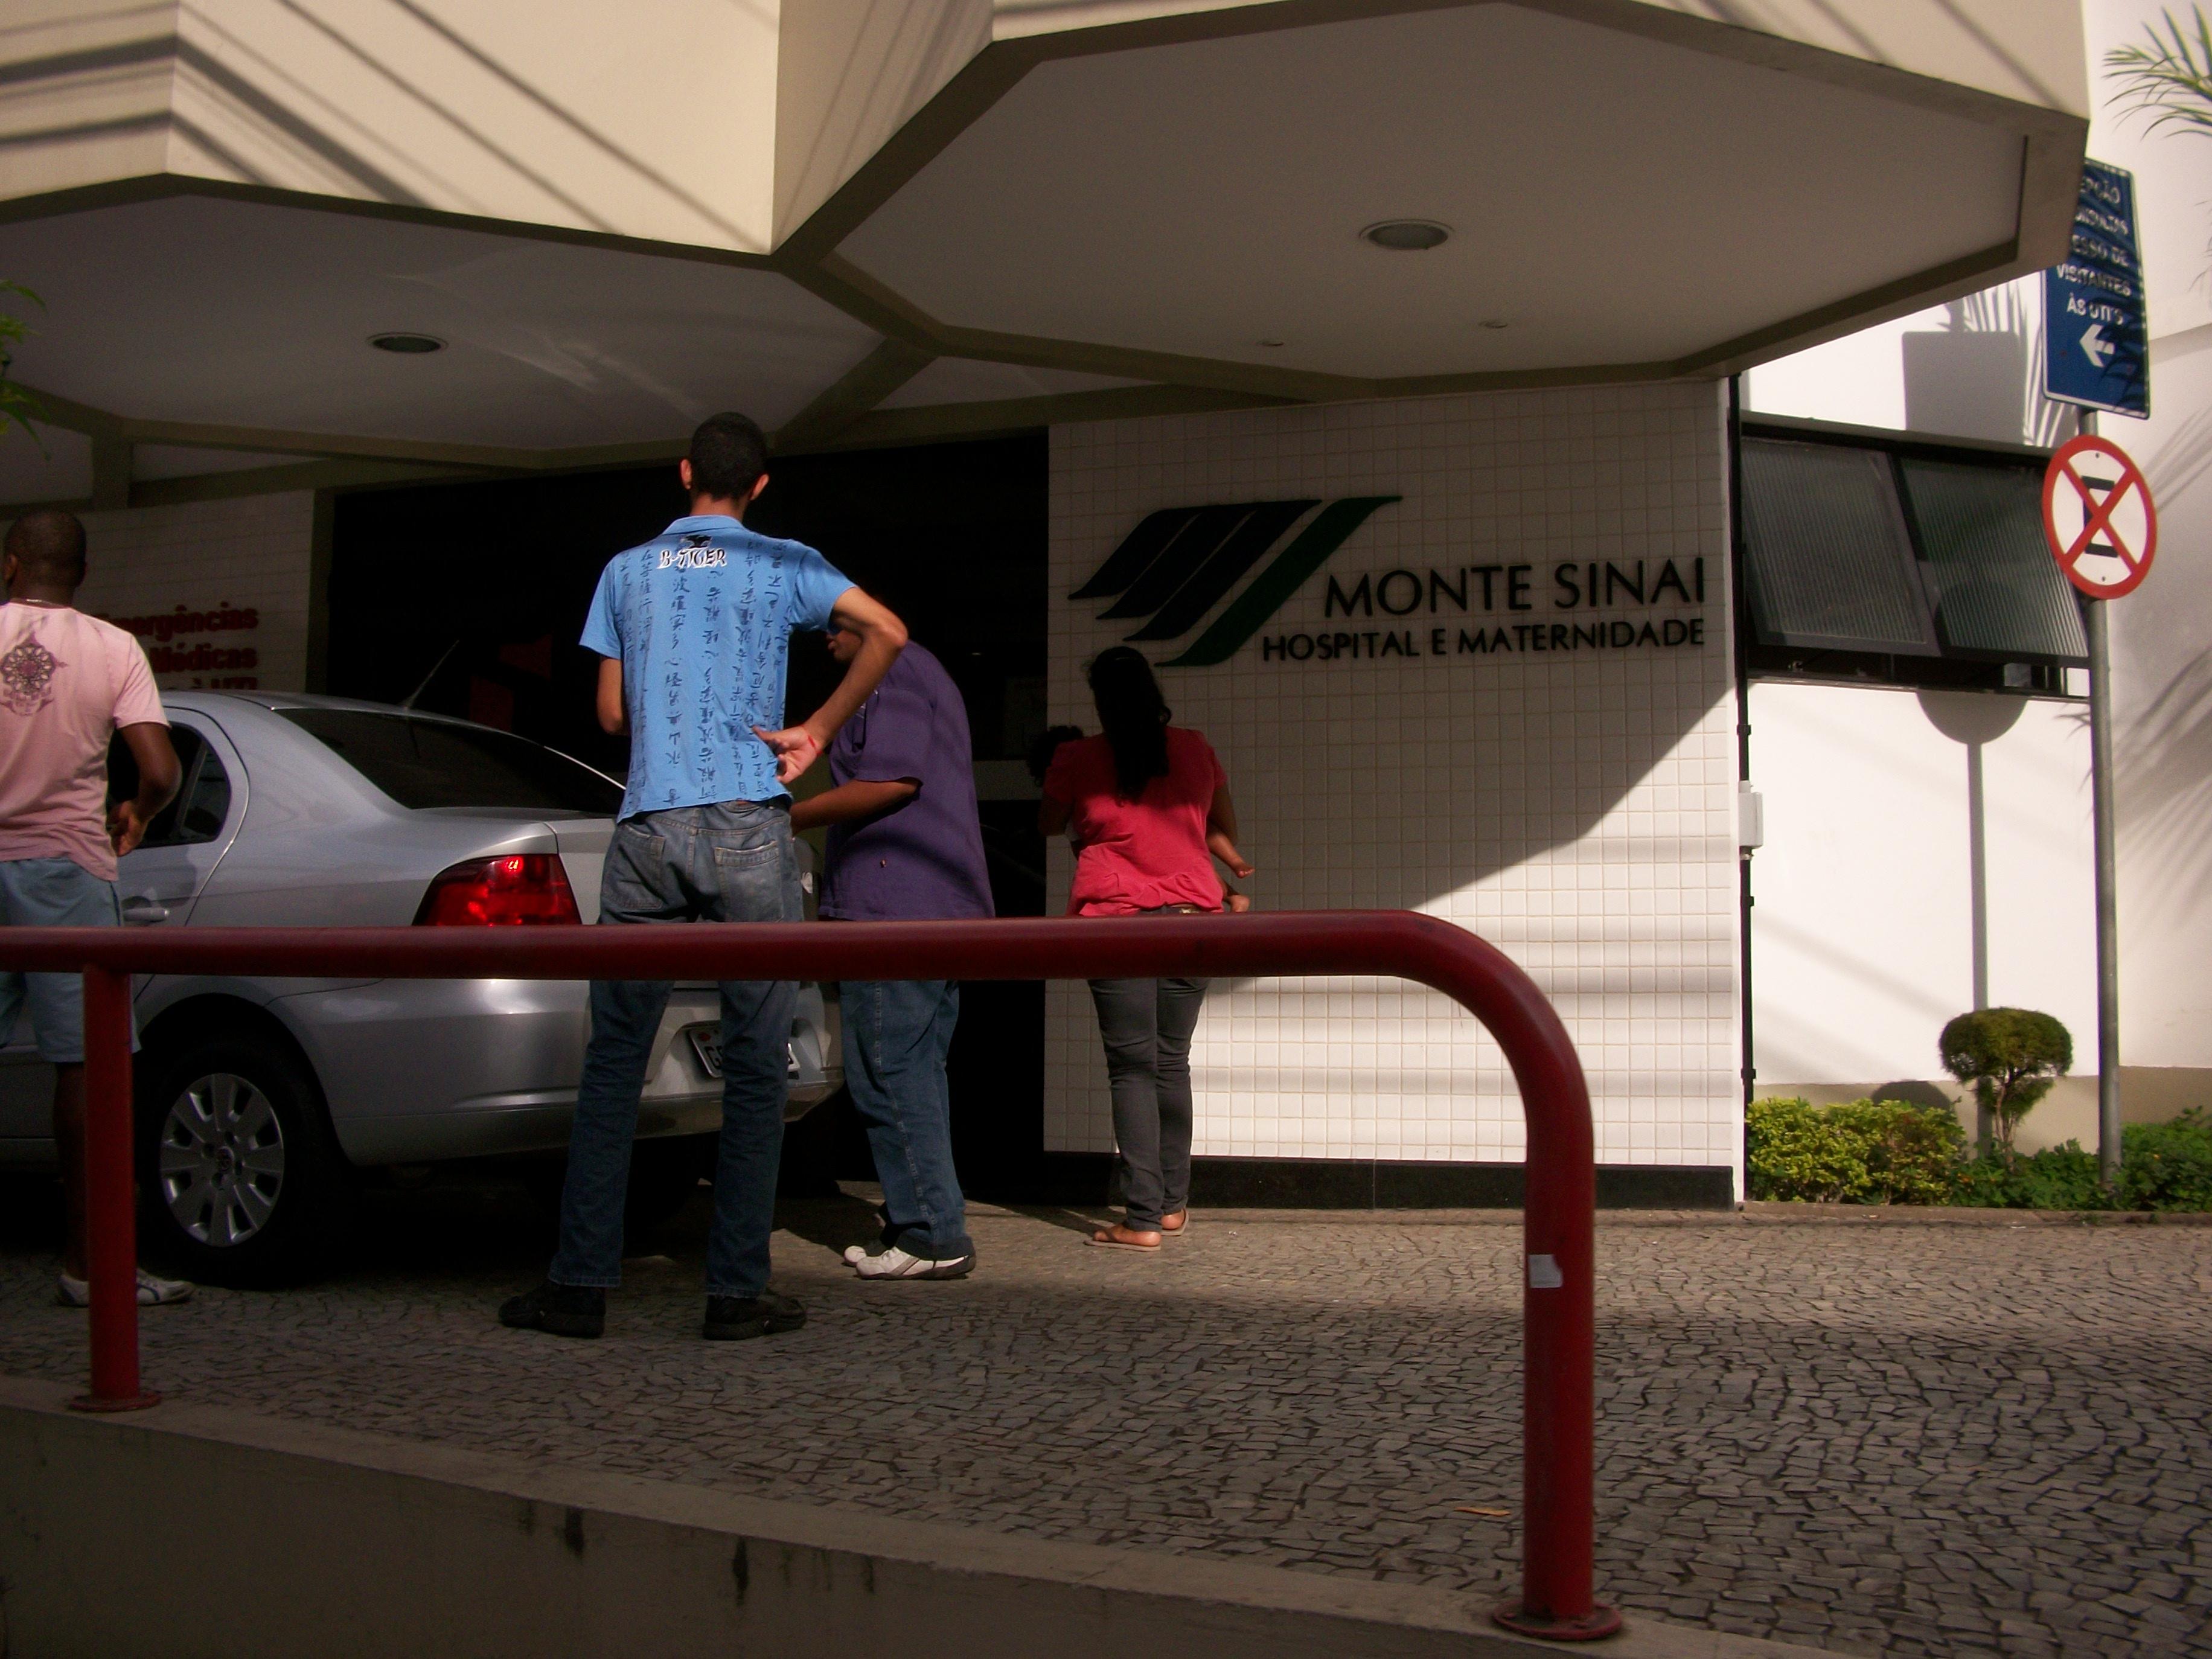 FileEntrada Do Hospital Monte Sinai